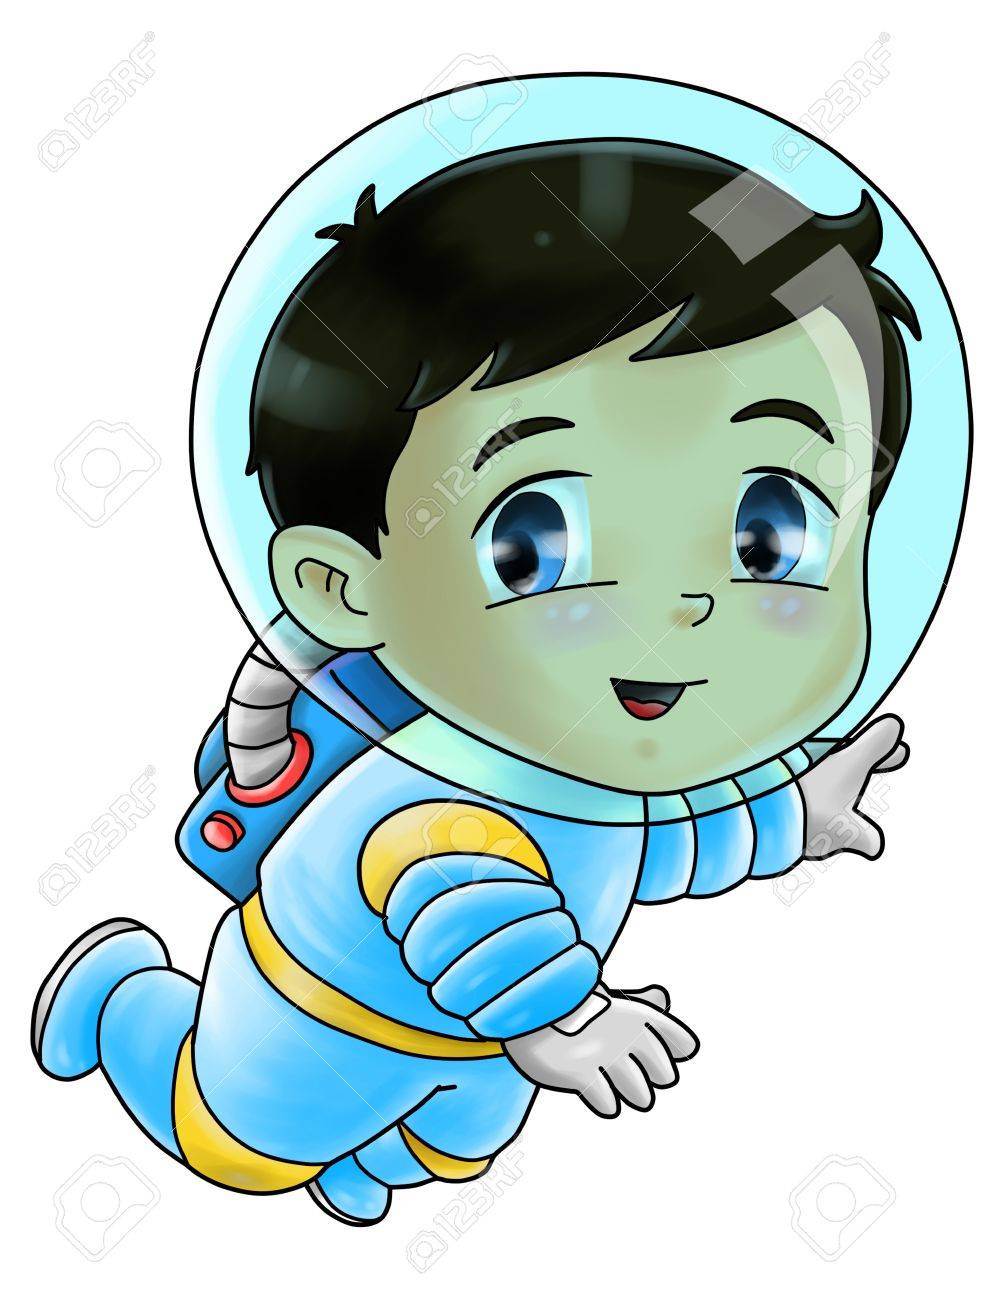 Cute cartoon illustration of an astronaut Stock Photo - 18890784